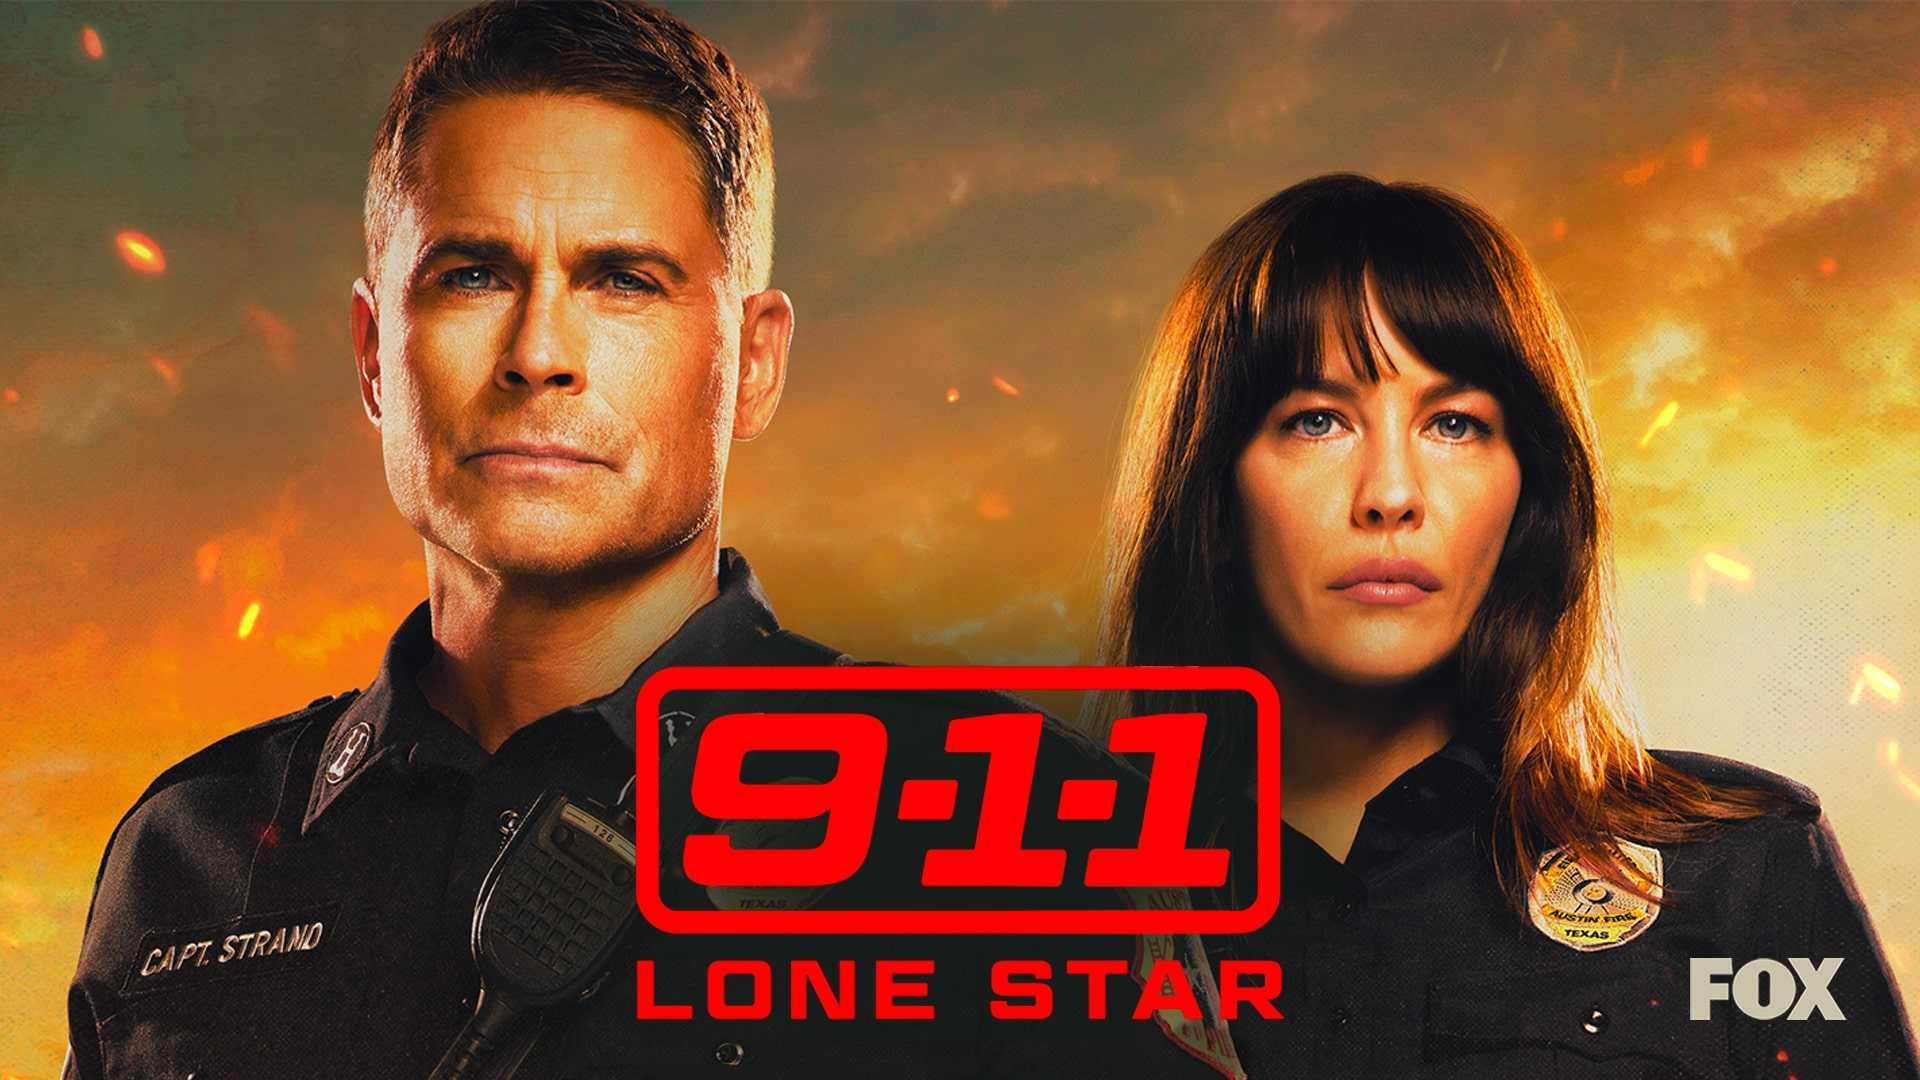 9-1-1: Lone Star Season 1